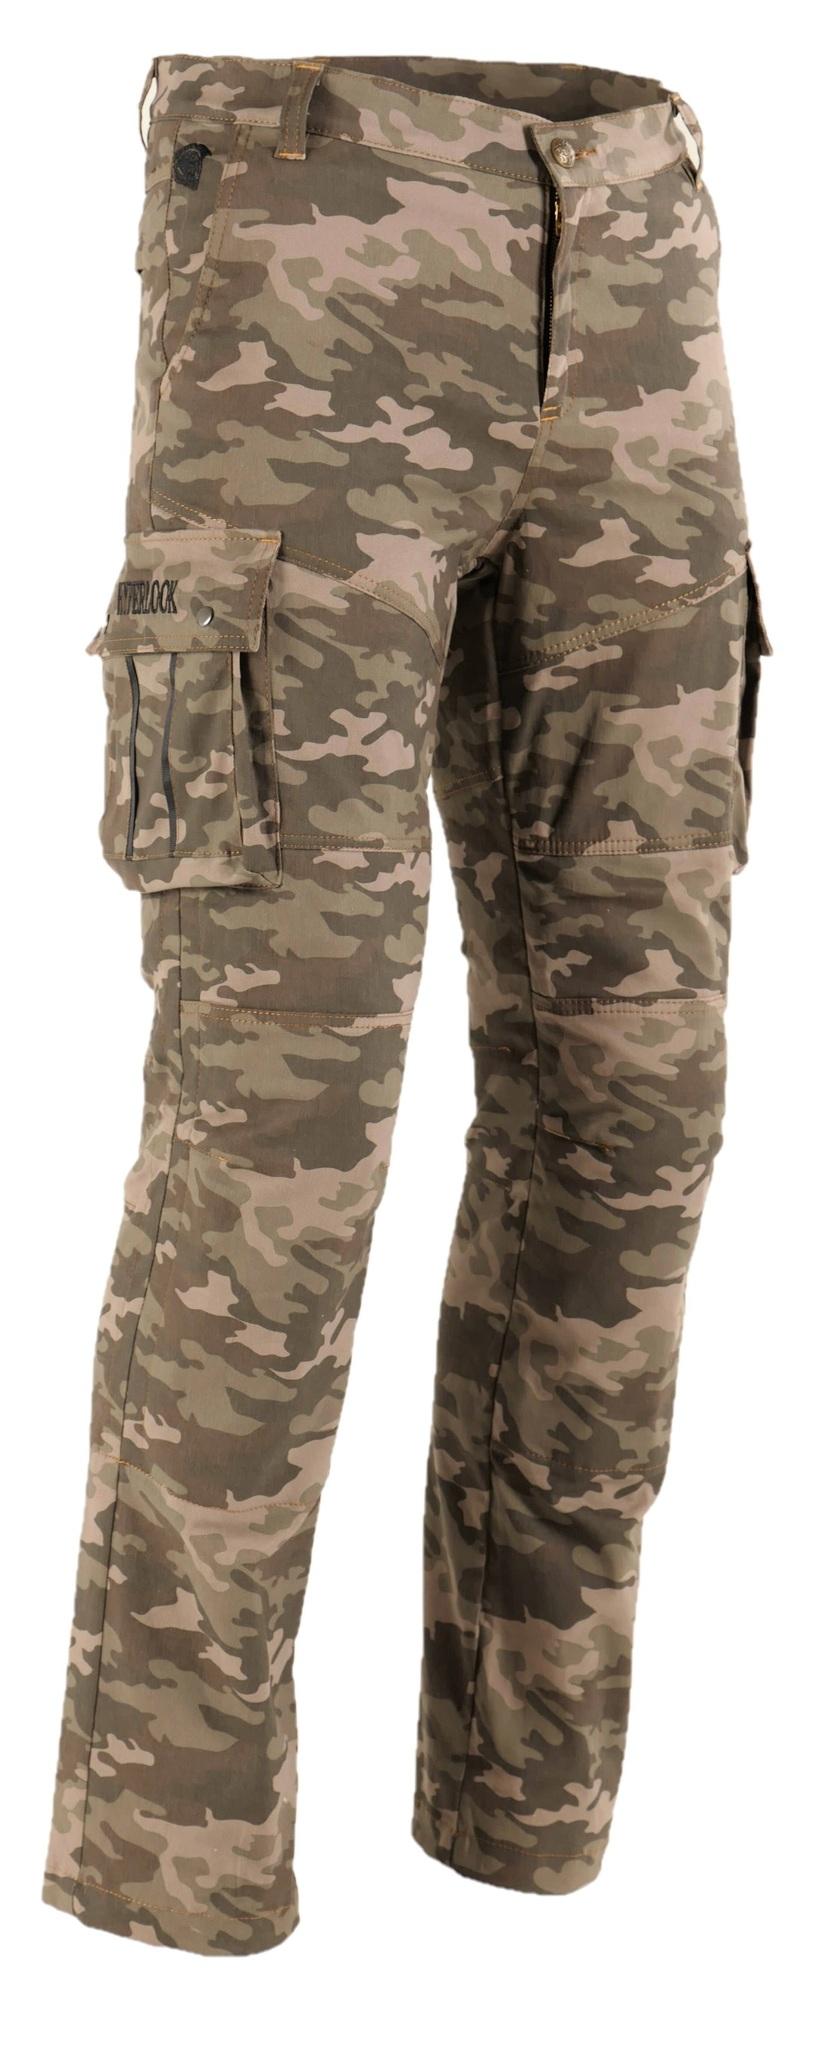 HYPERLOOK BARRACUDA ARMY camouflage